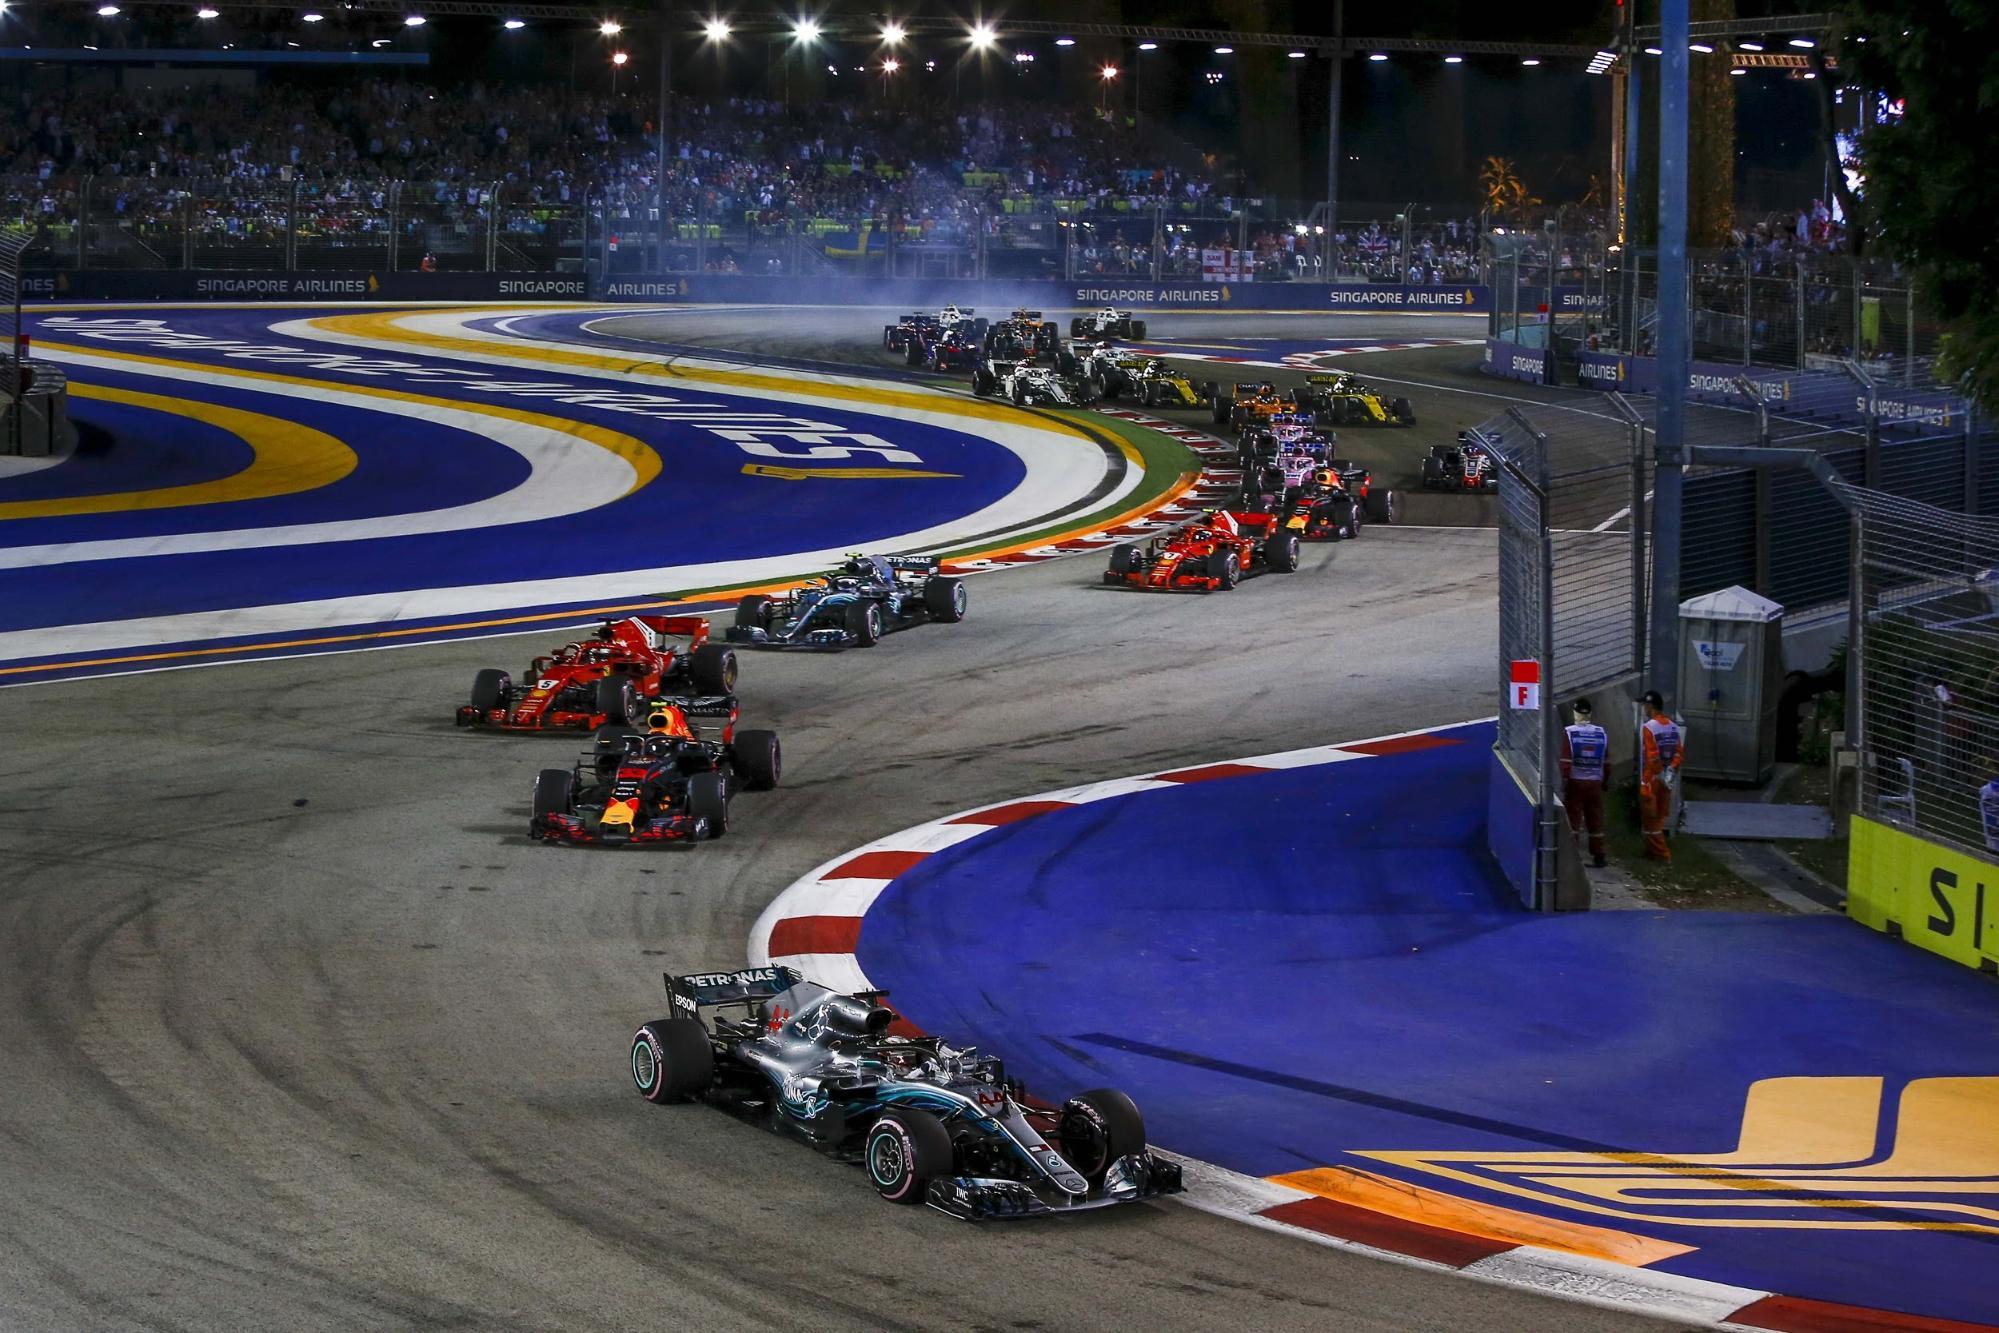 Singapore Grand Prix 2019 - race track